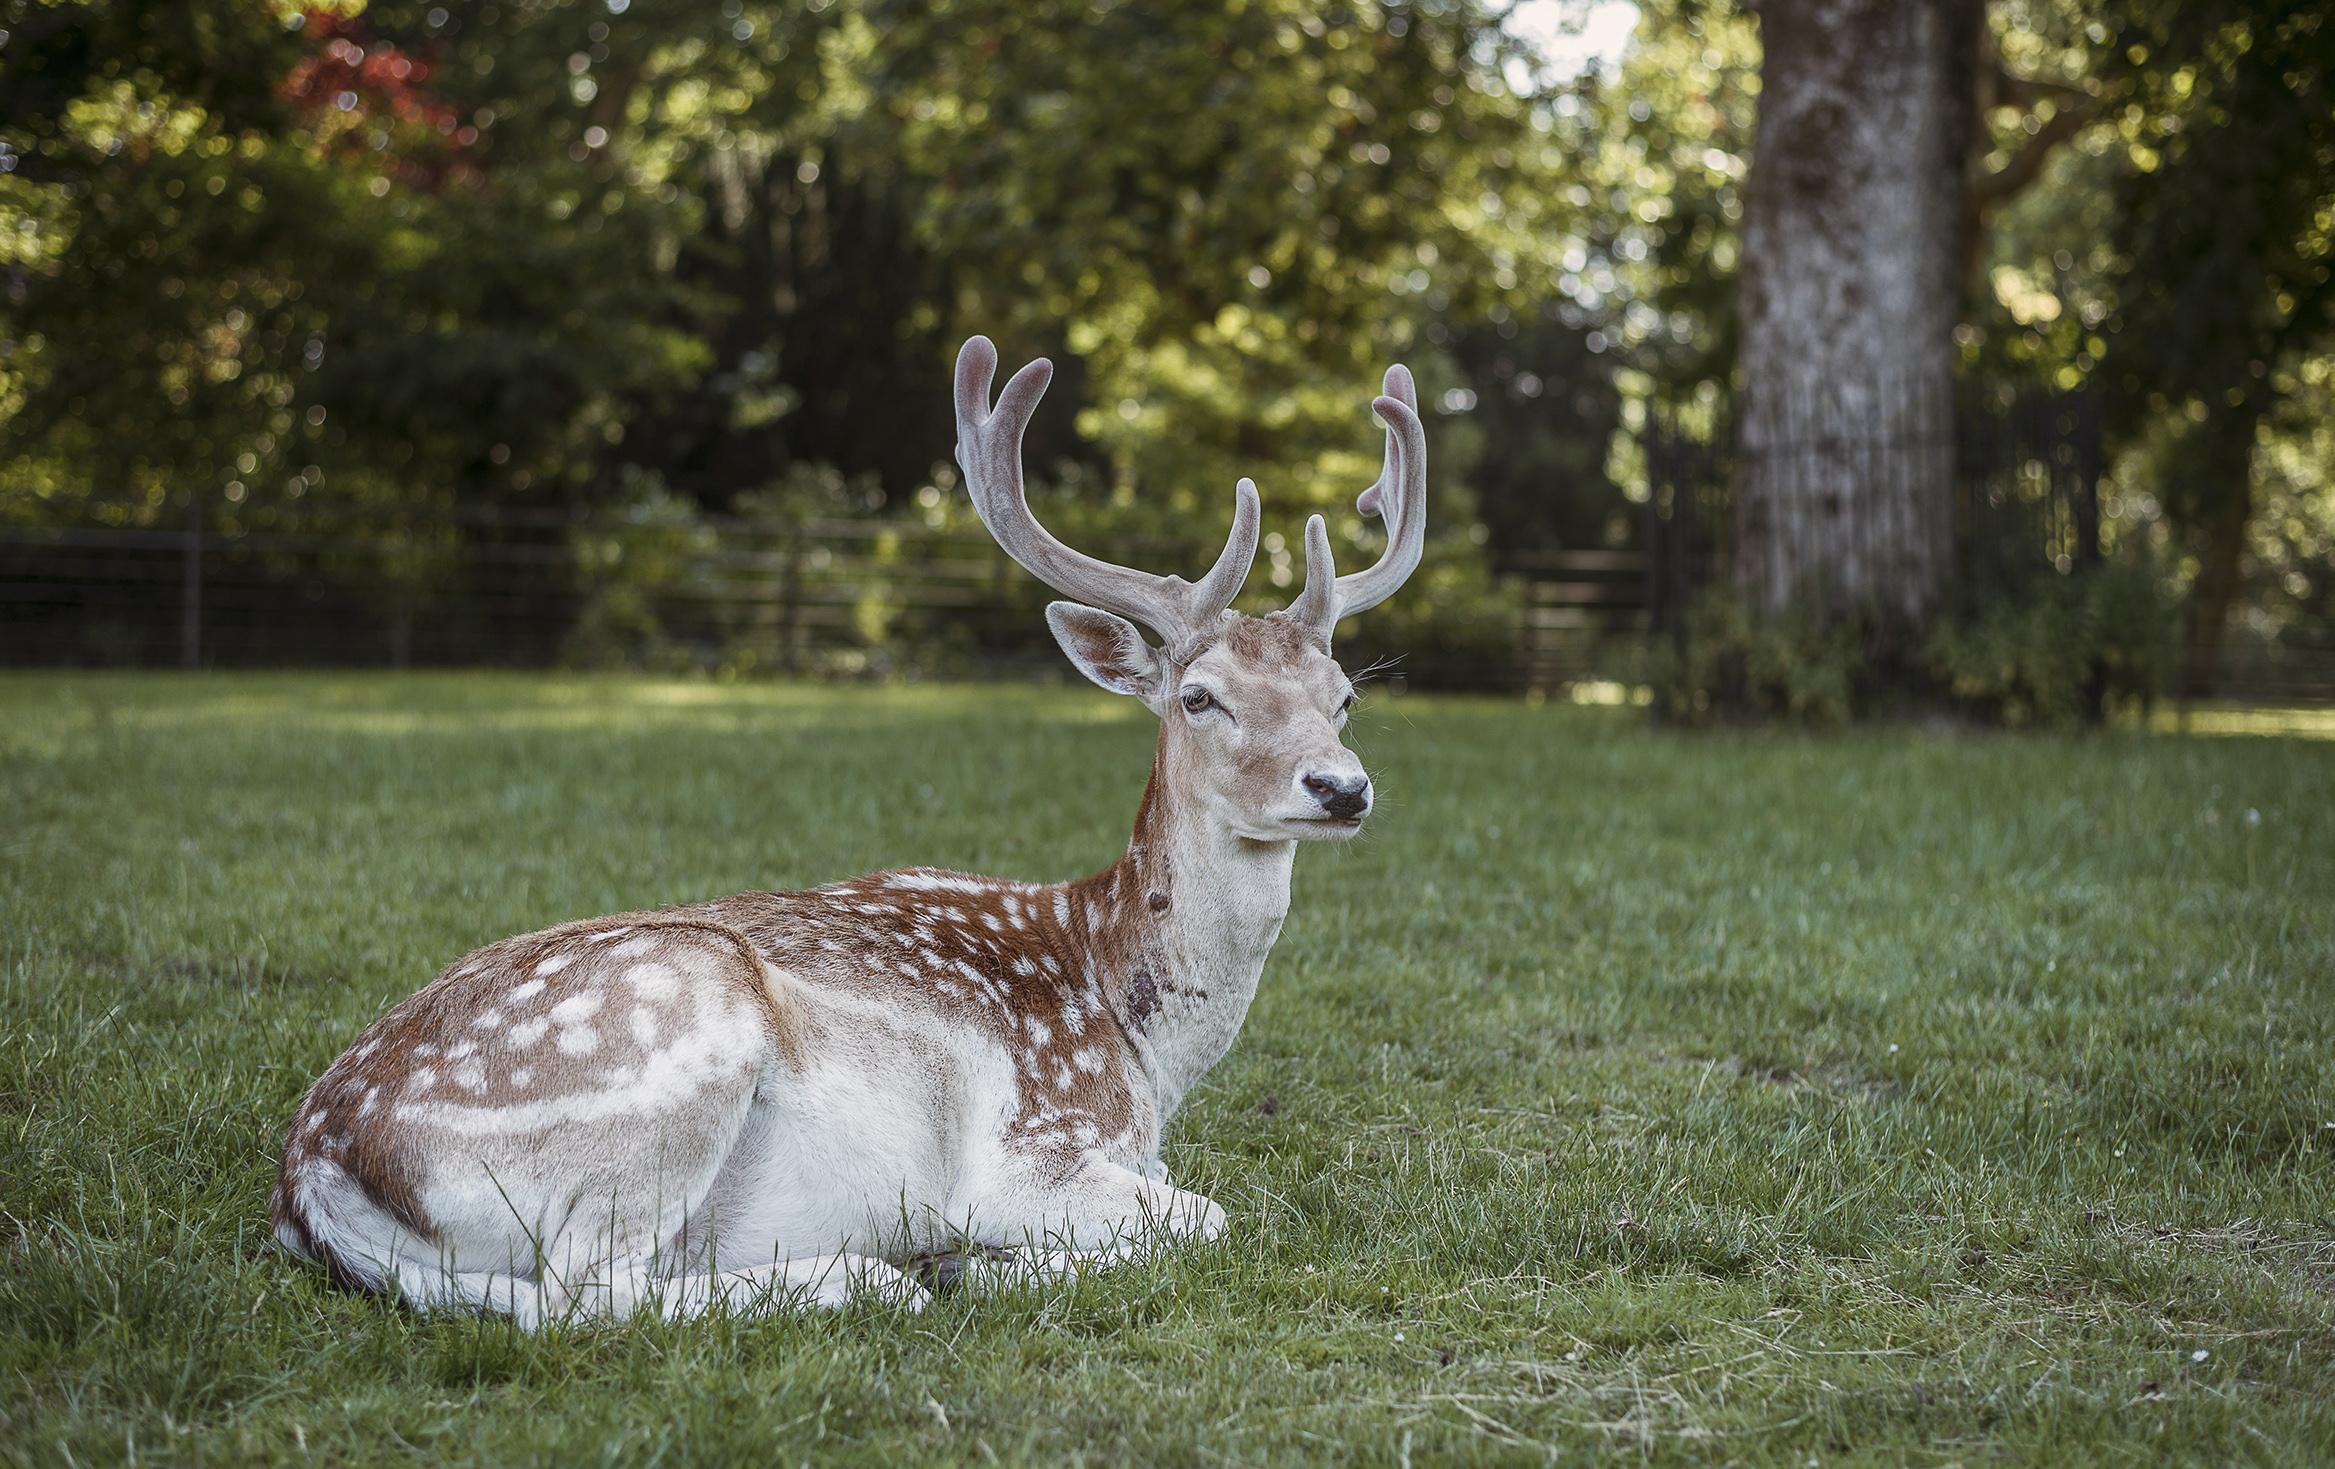 deer resting at park